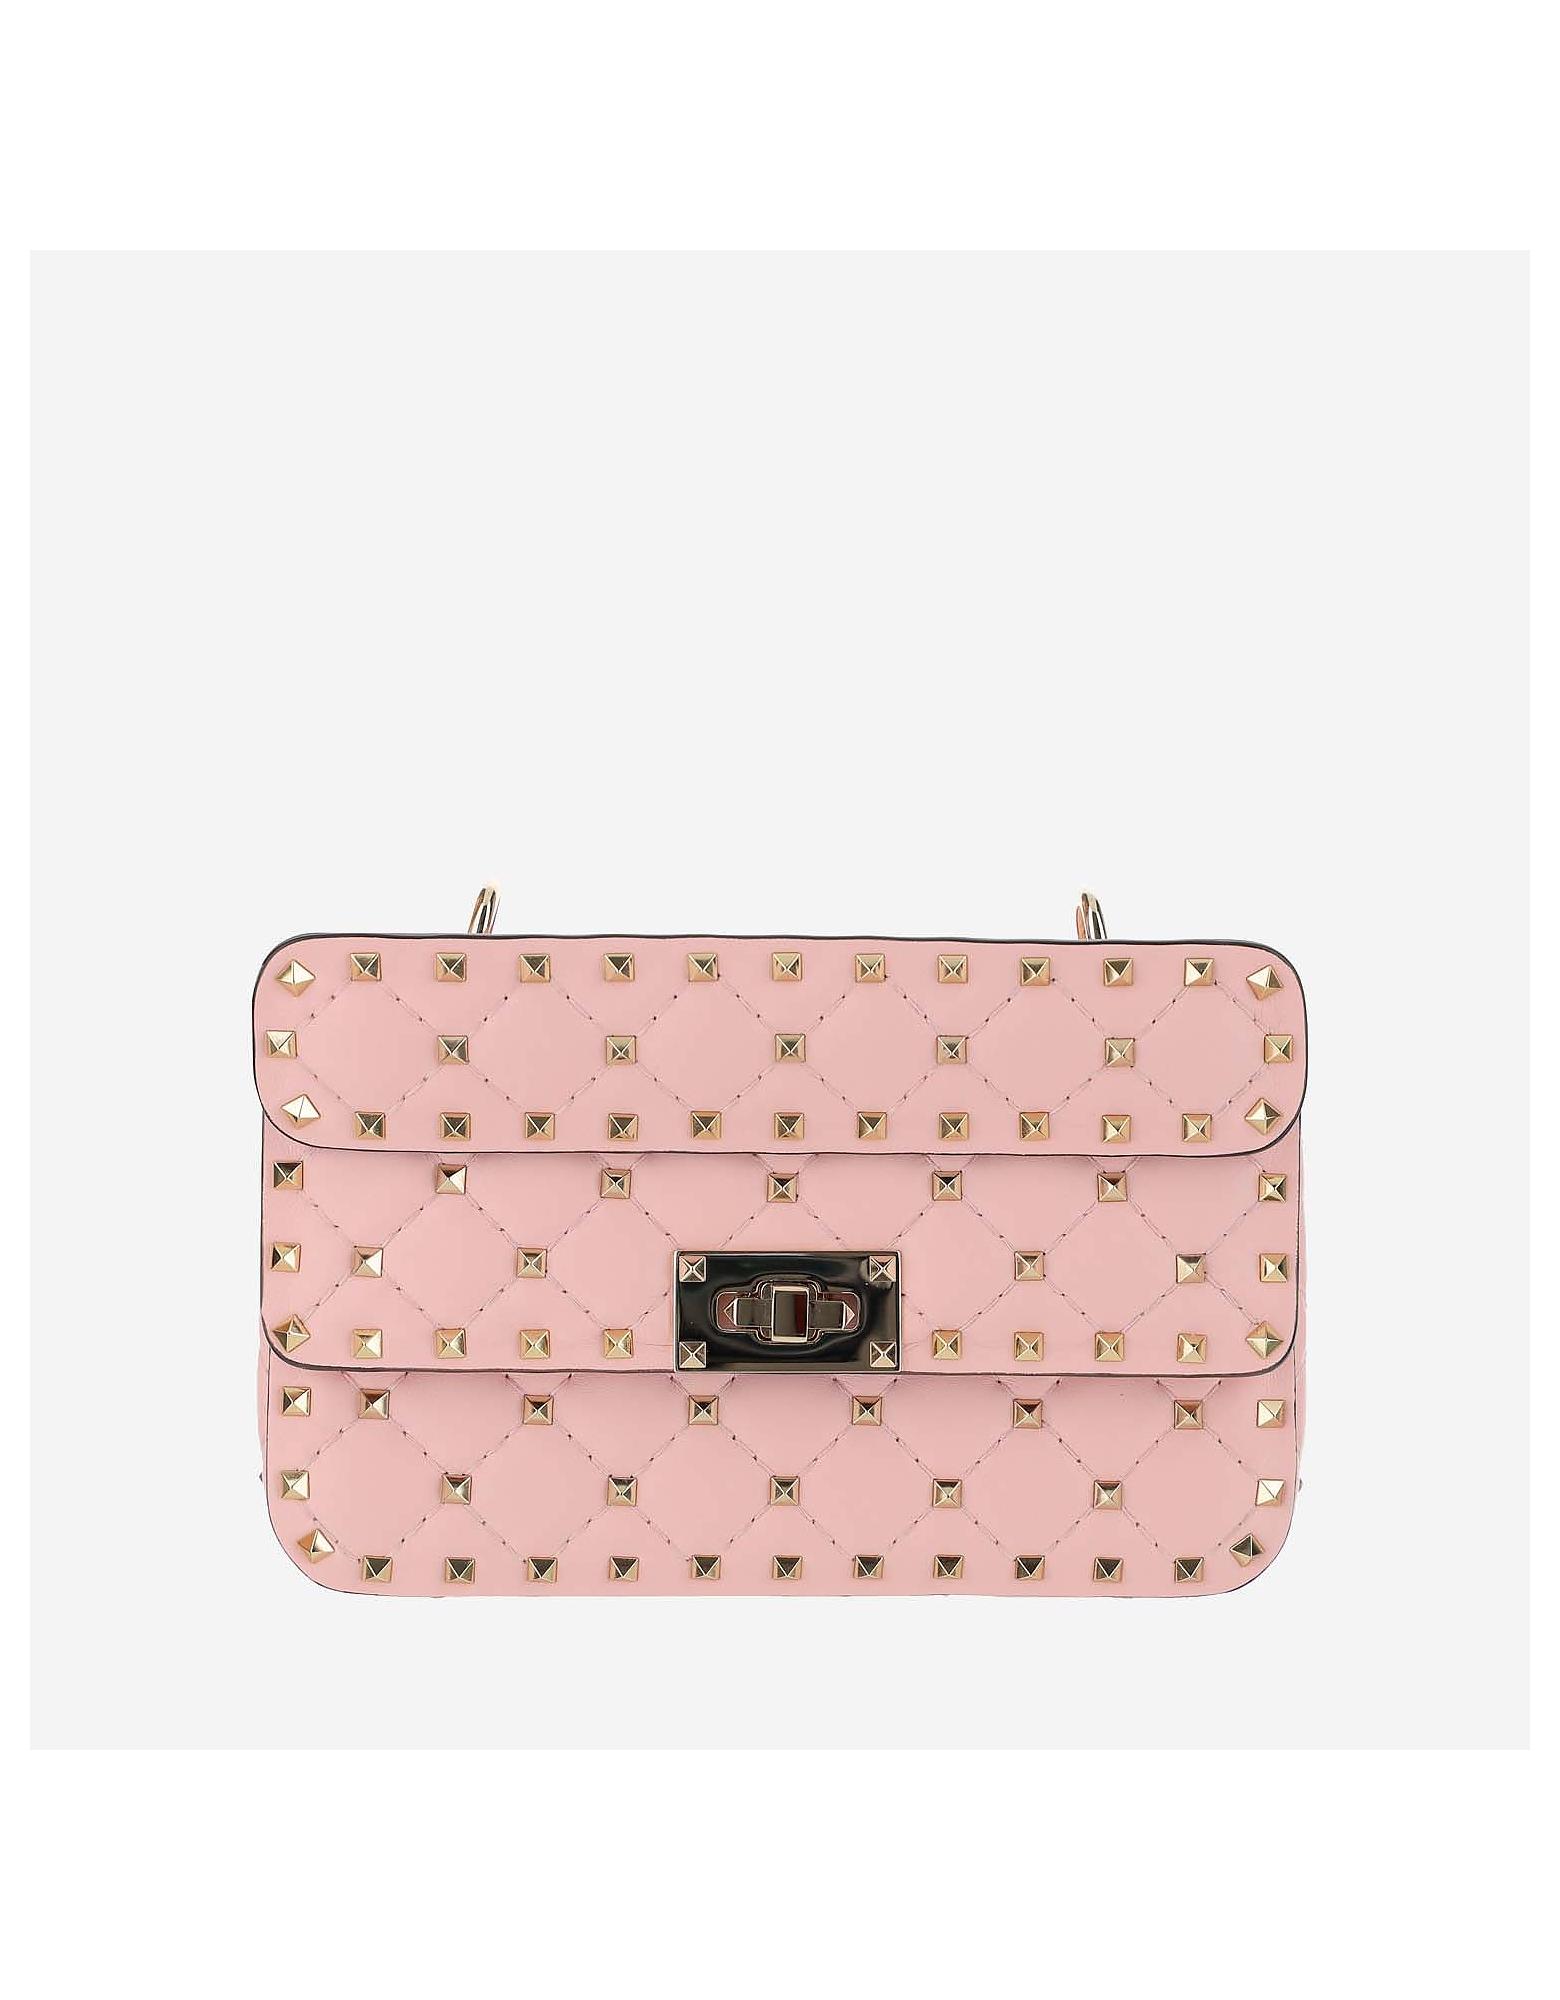 Valentino Designer Handbags, Pink shoulder